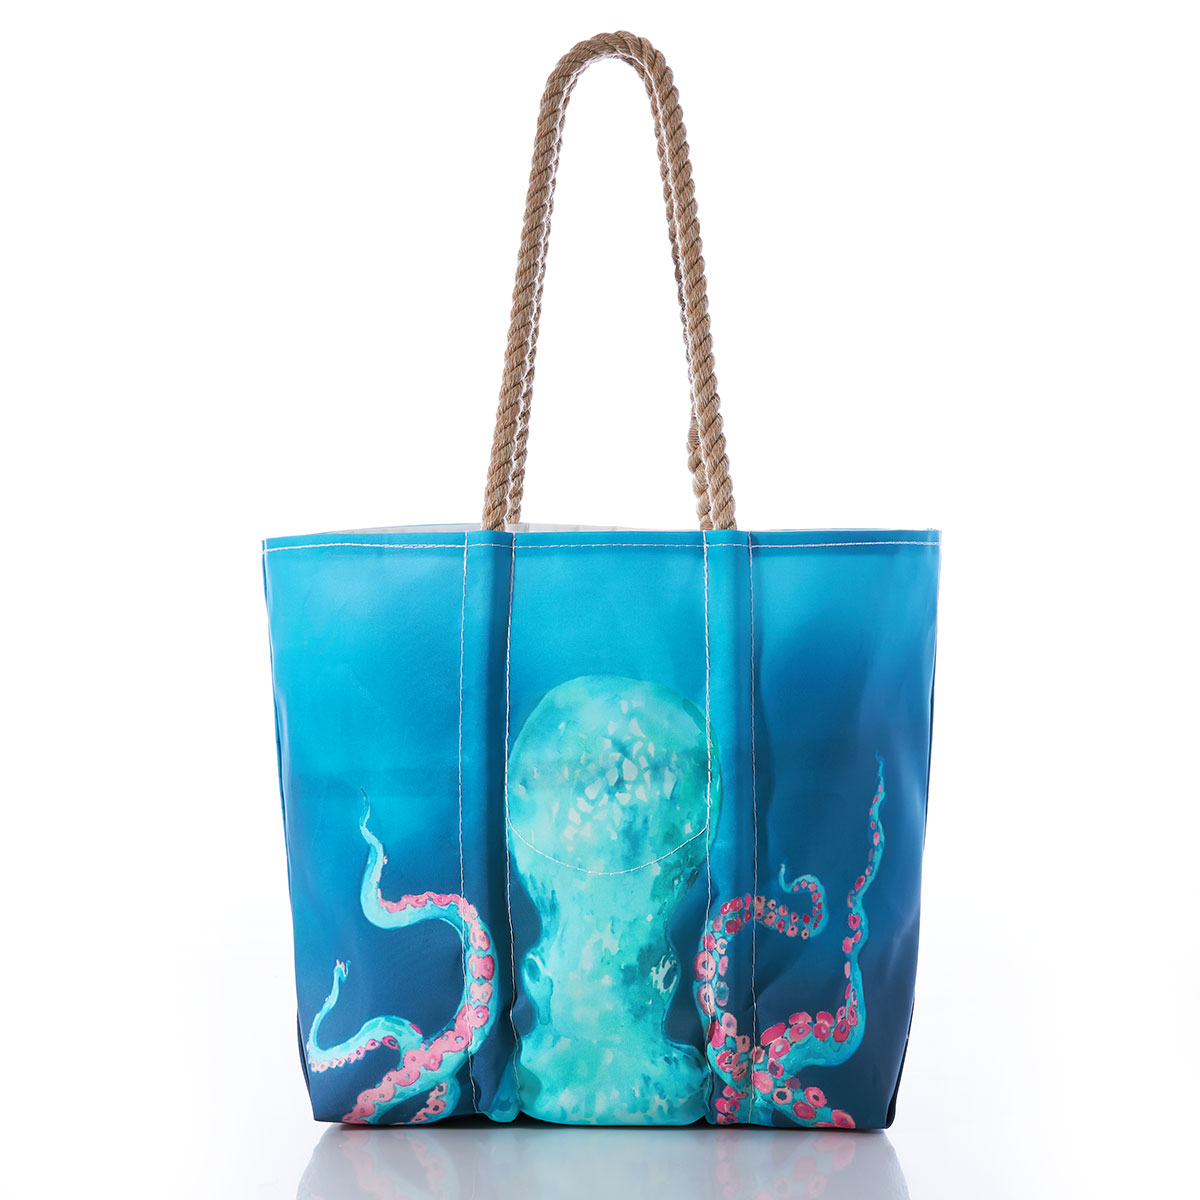 Glitter Shopping tote Octopus Tote Multipurpose Reusable Bag Sealife ocean bag Gift ocean lover Large purse Beach bag Marine life